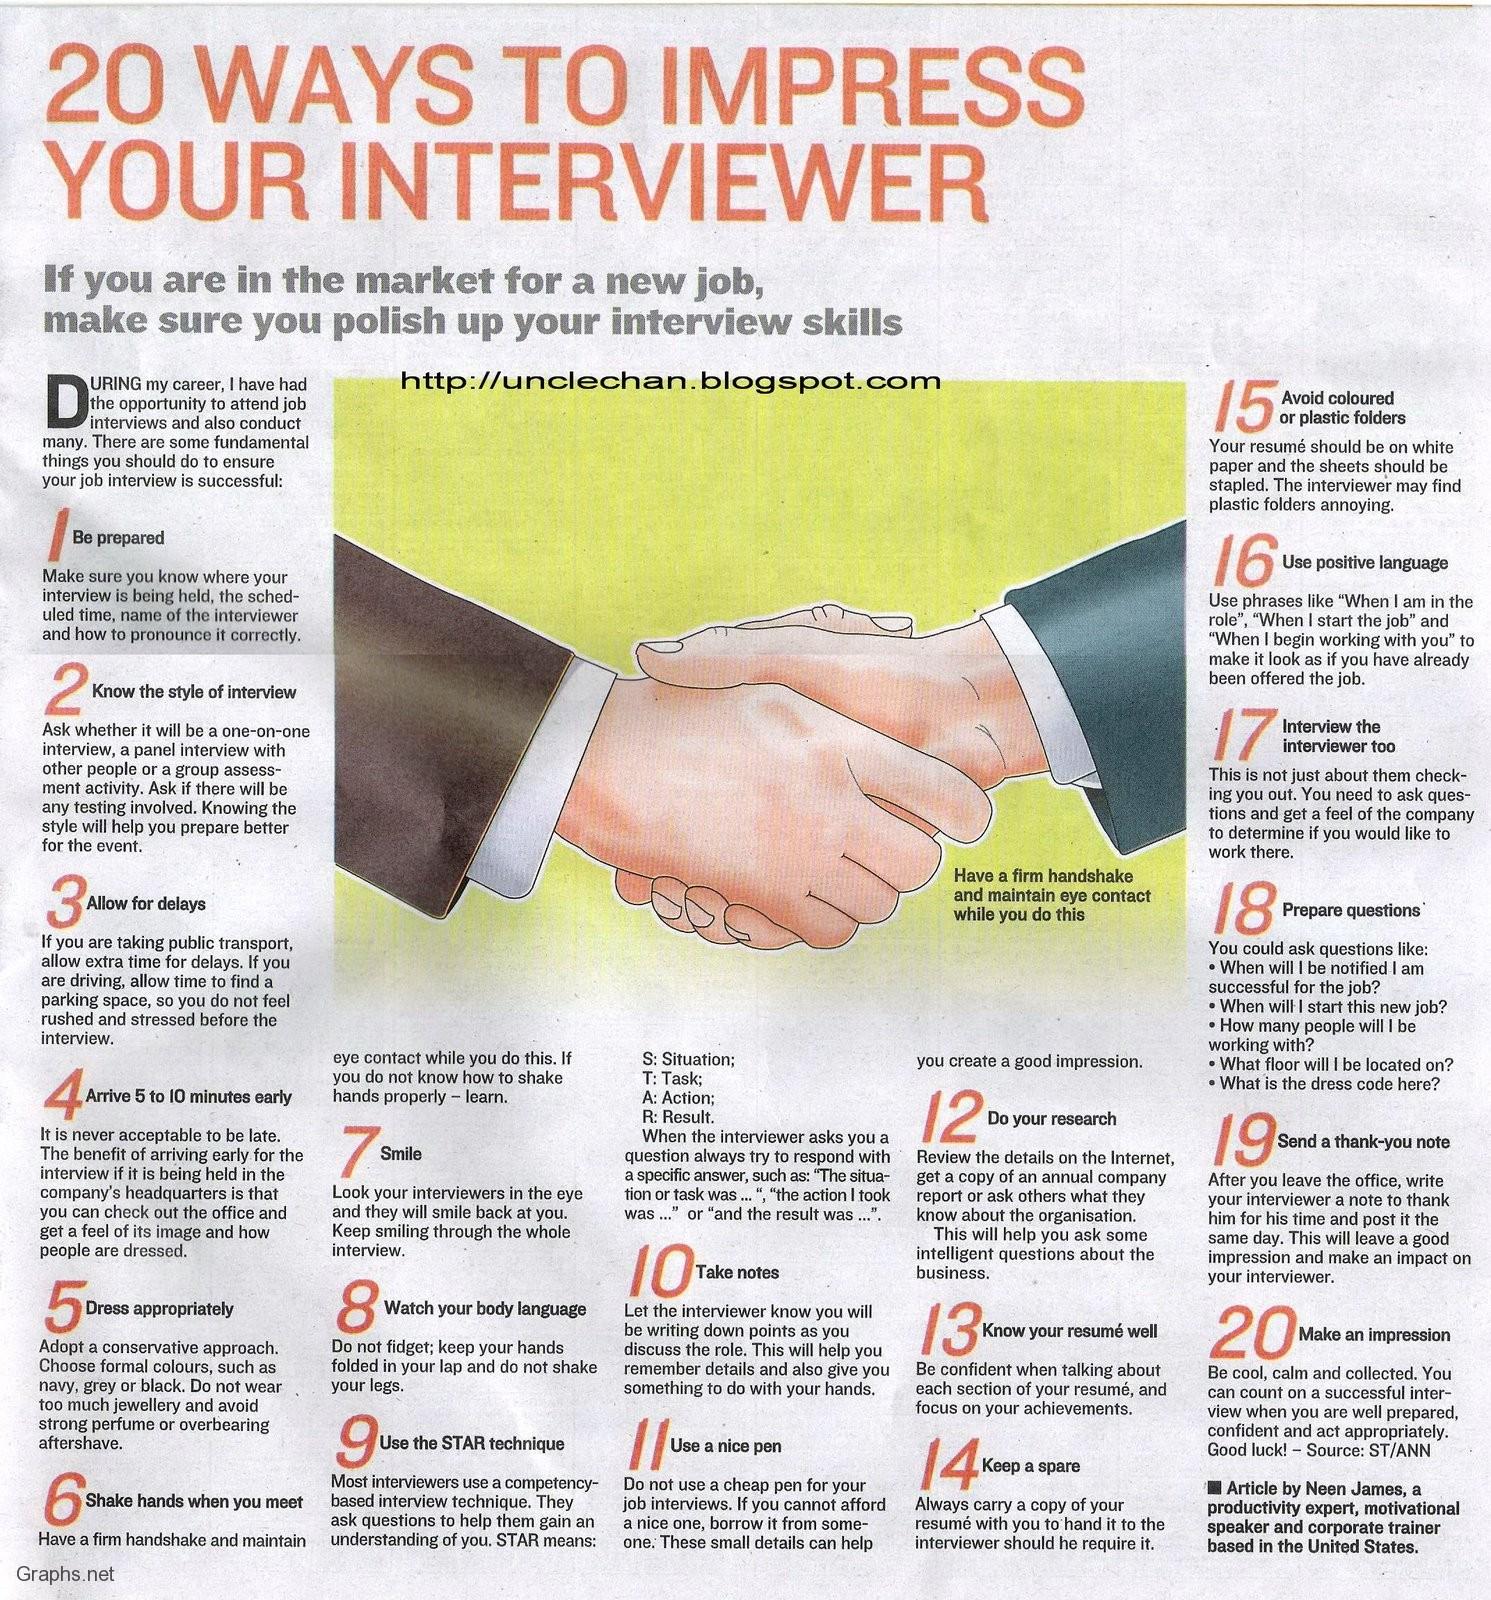 Top 20 Ways To Impress Interviewers